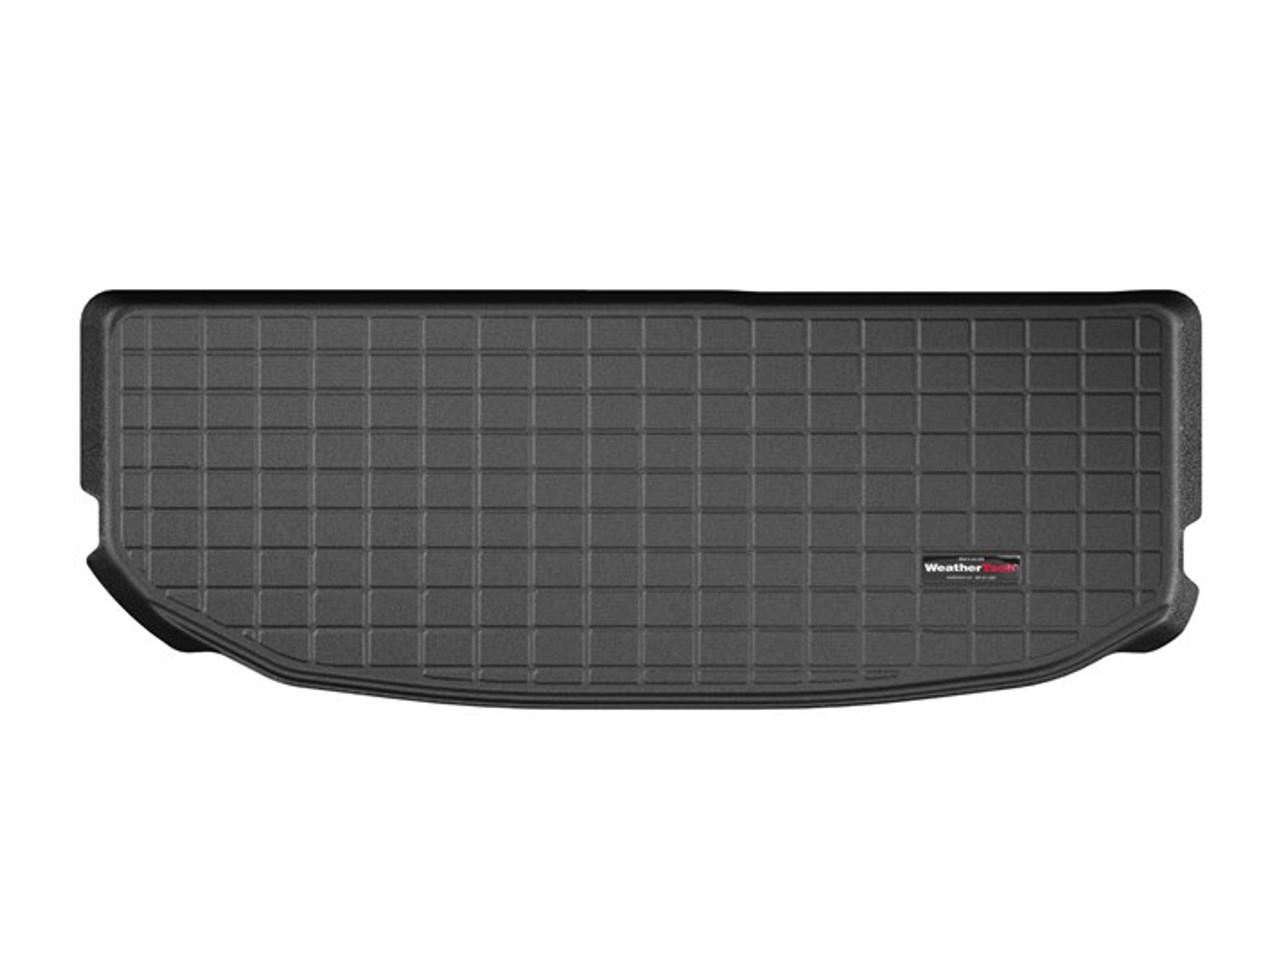 2020-2022 Hyundai Palisade WeatherTech Cargo Liner - Behind 3rd Row (Black)